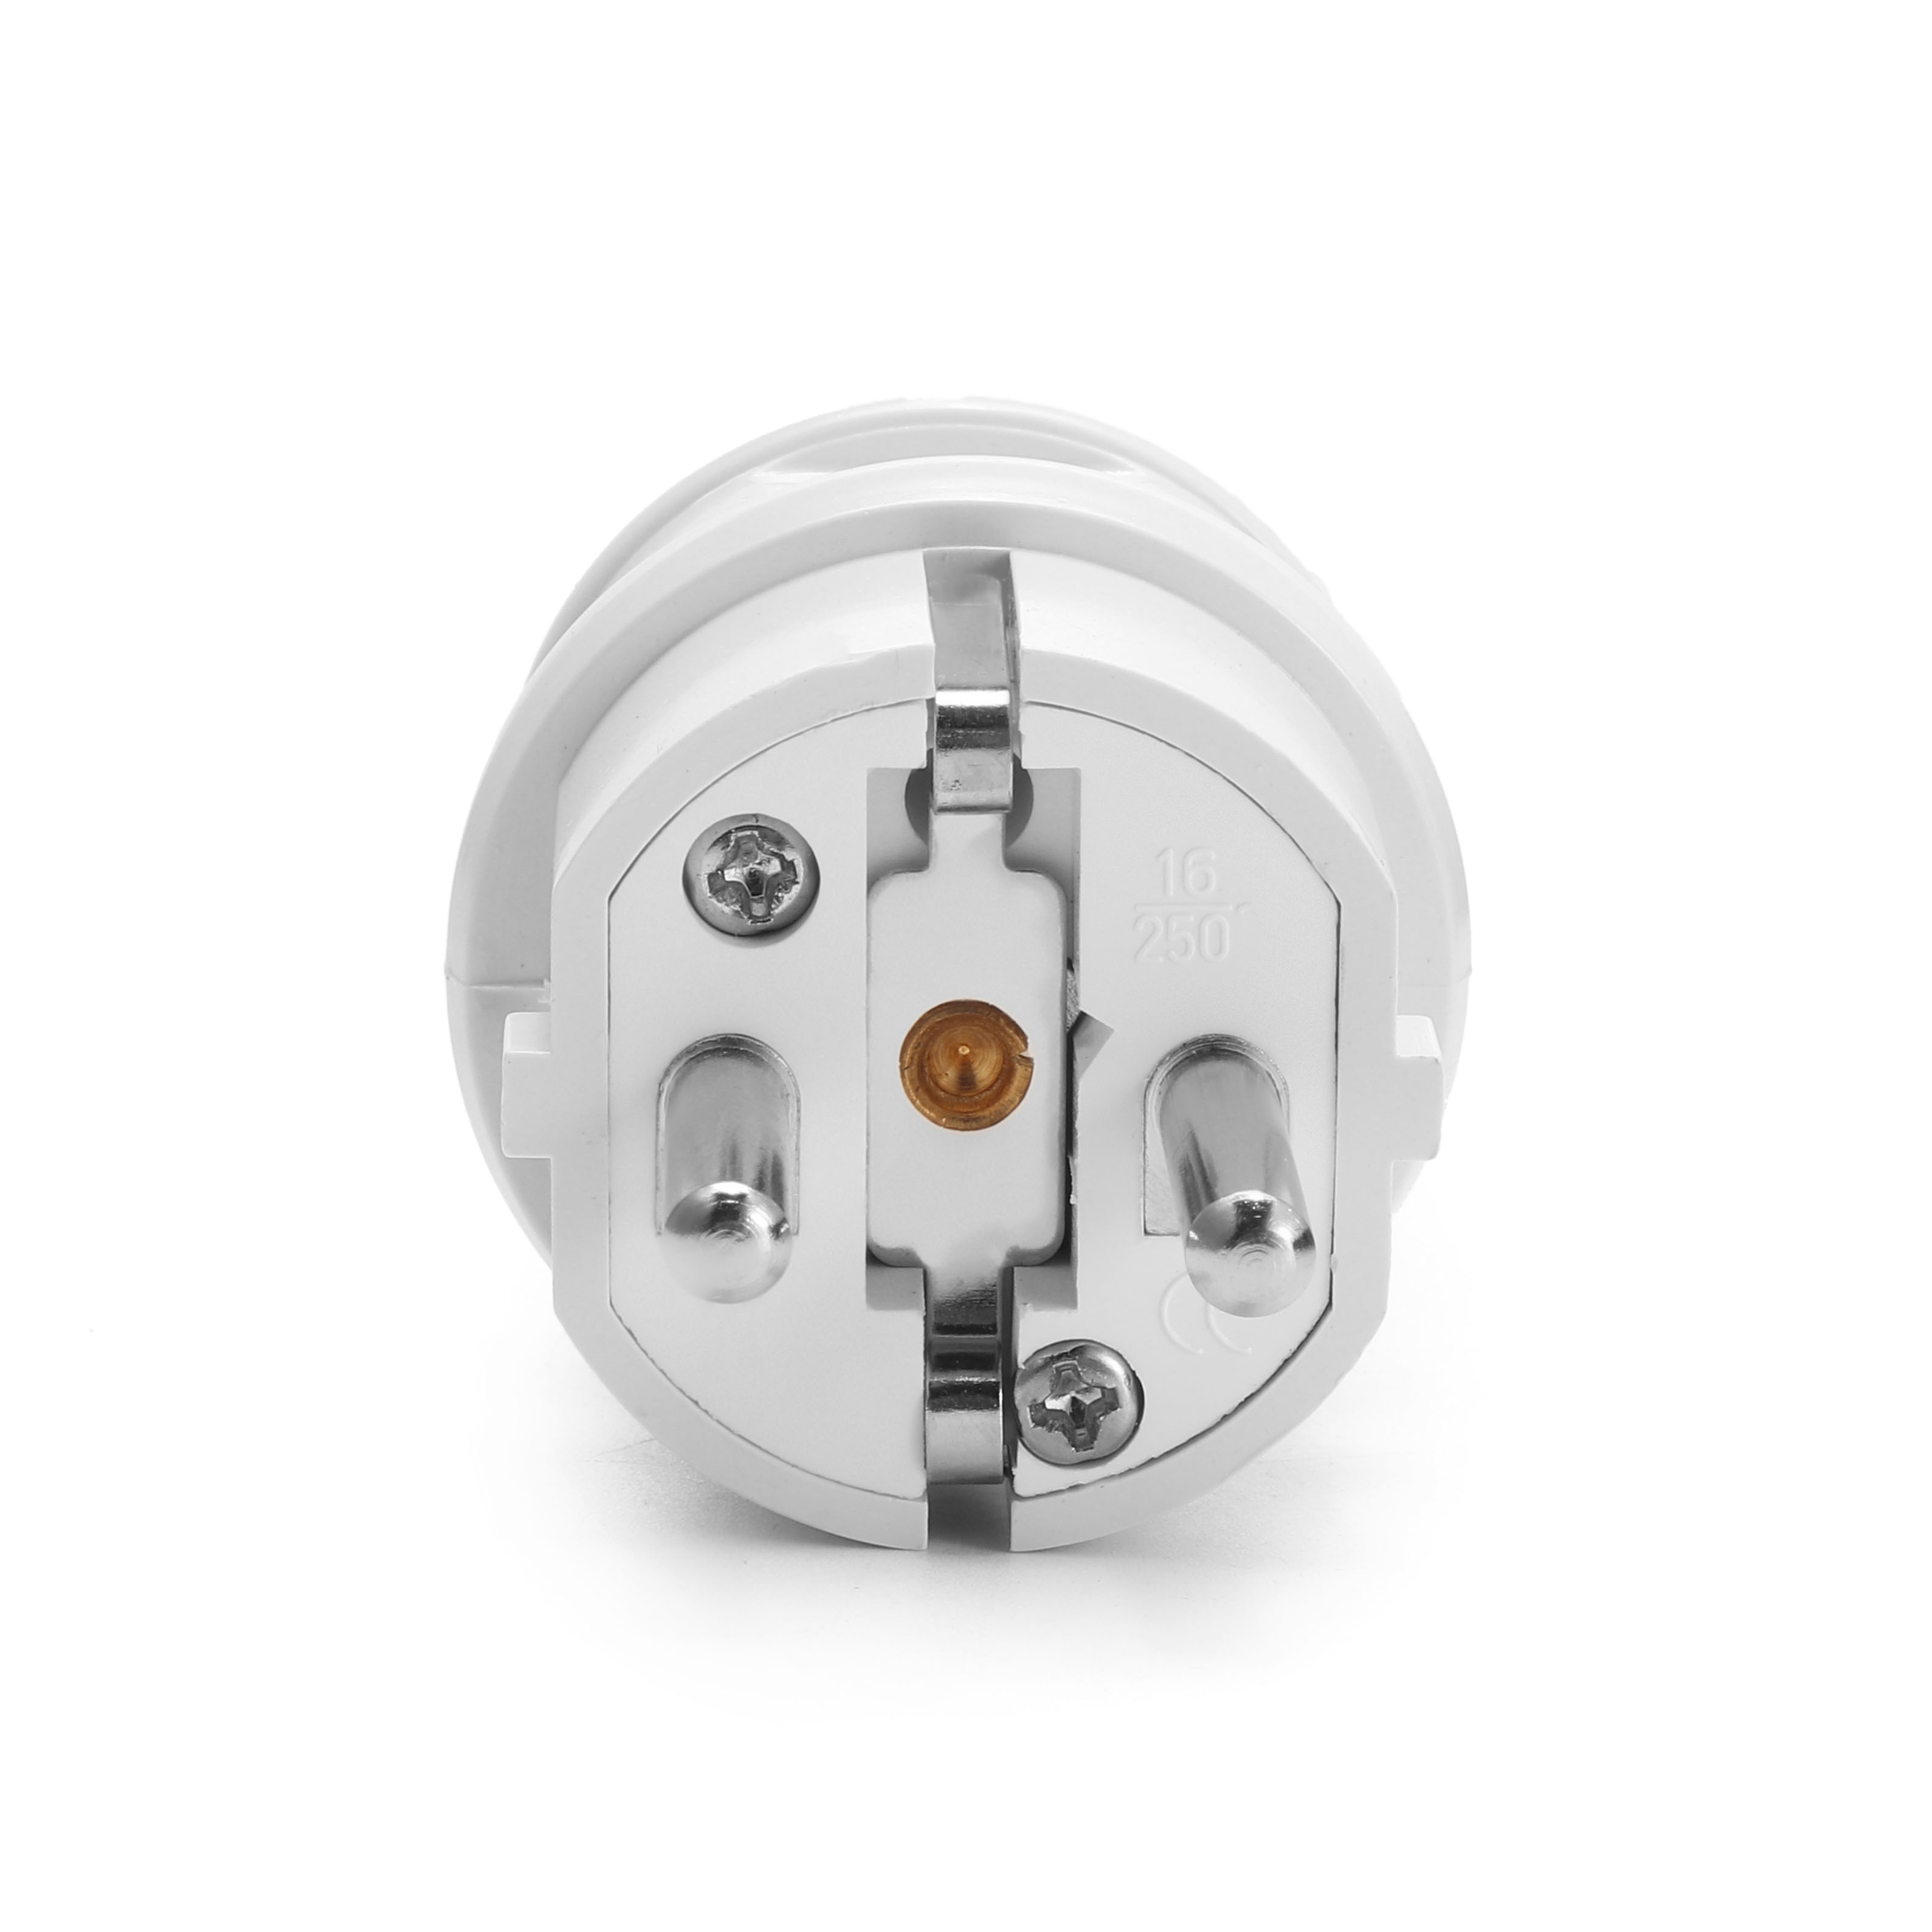 Loskii HA-18 EU Wire Plug Residential Round Pins Plug 16-Amp 250 ...